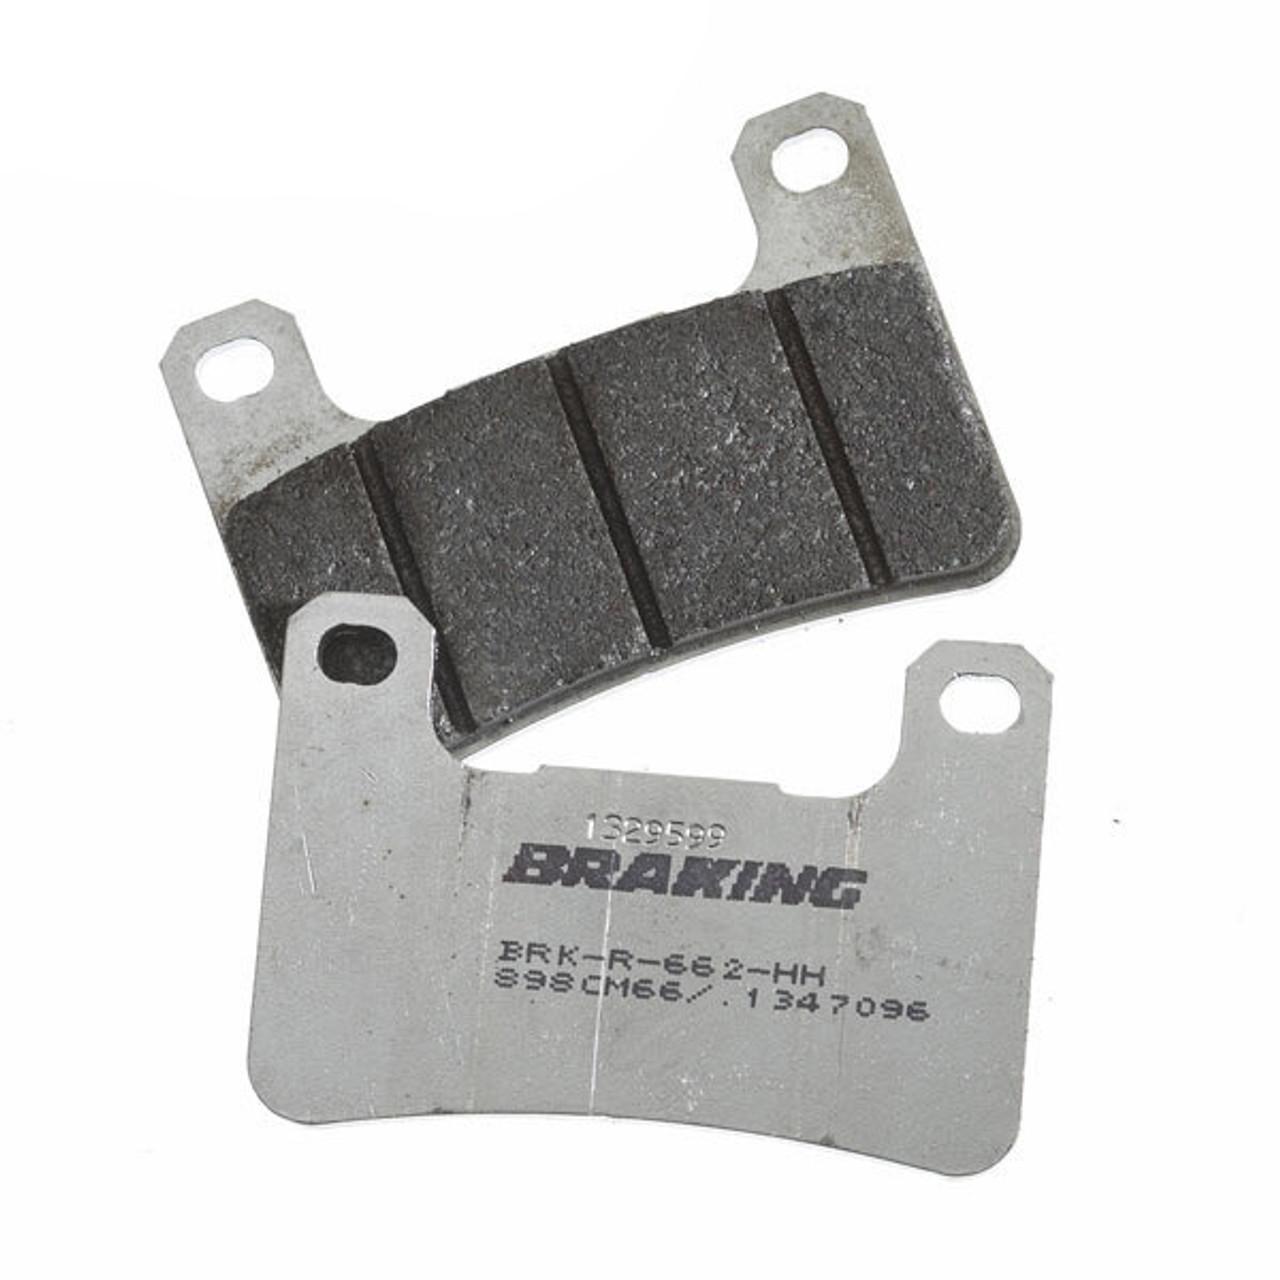 Honda Brake Pads >> Braking Honda Cbr600rr 07 19 Cm66 Racing Front Brake Pads